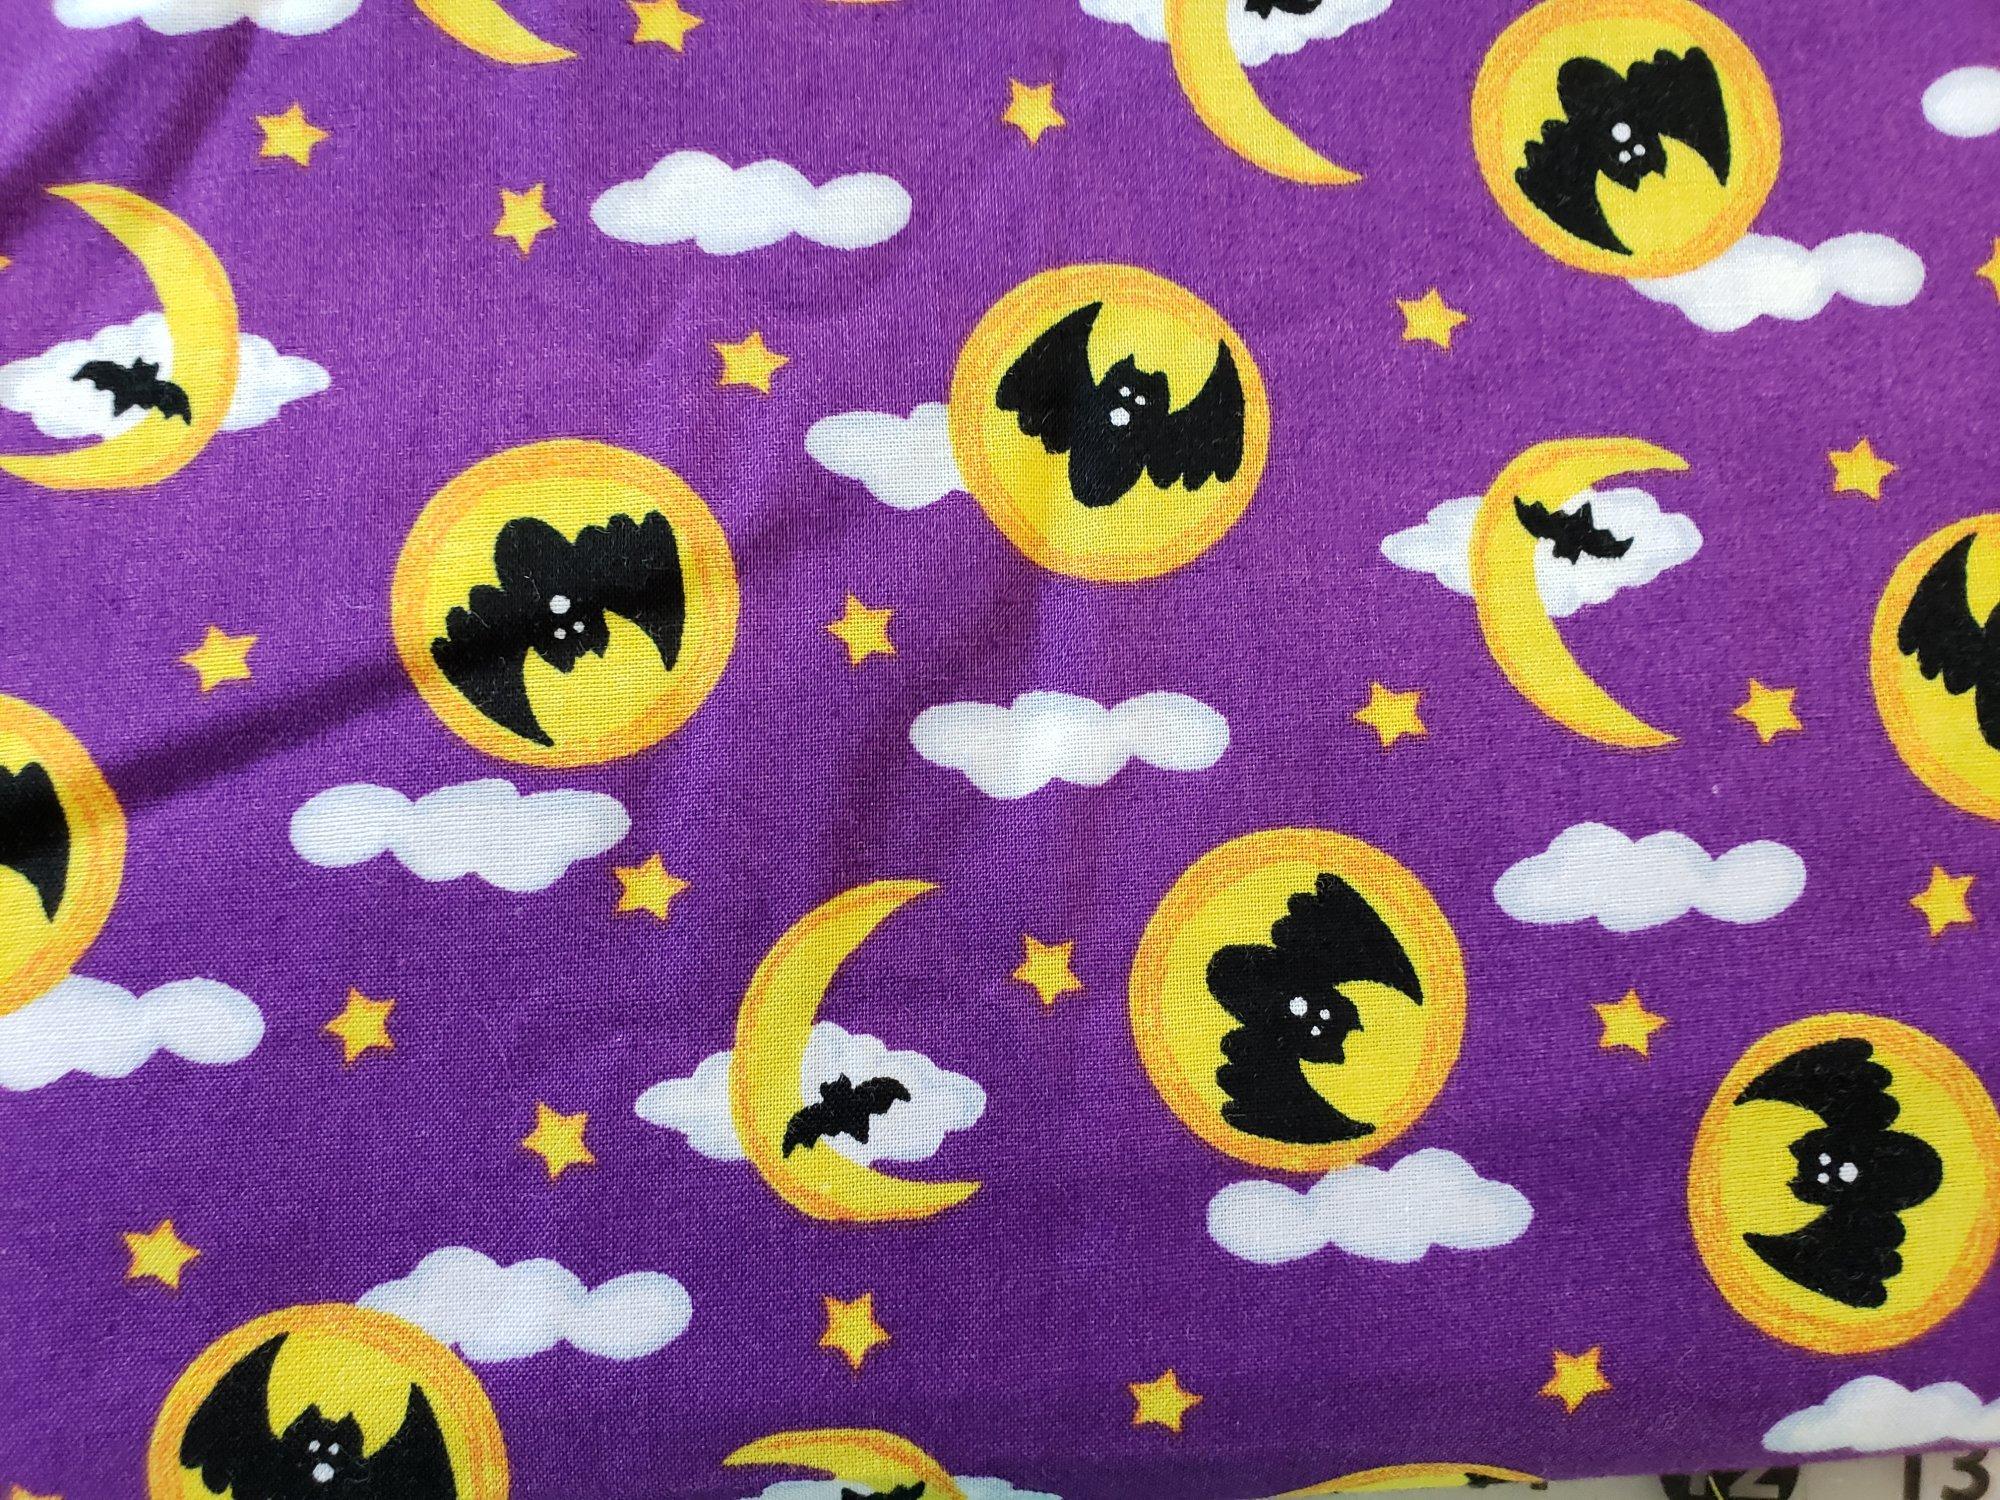 Studio E Bats and Moons on Purple Background